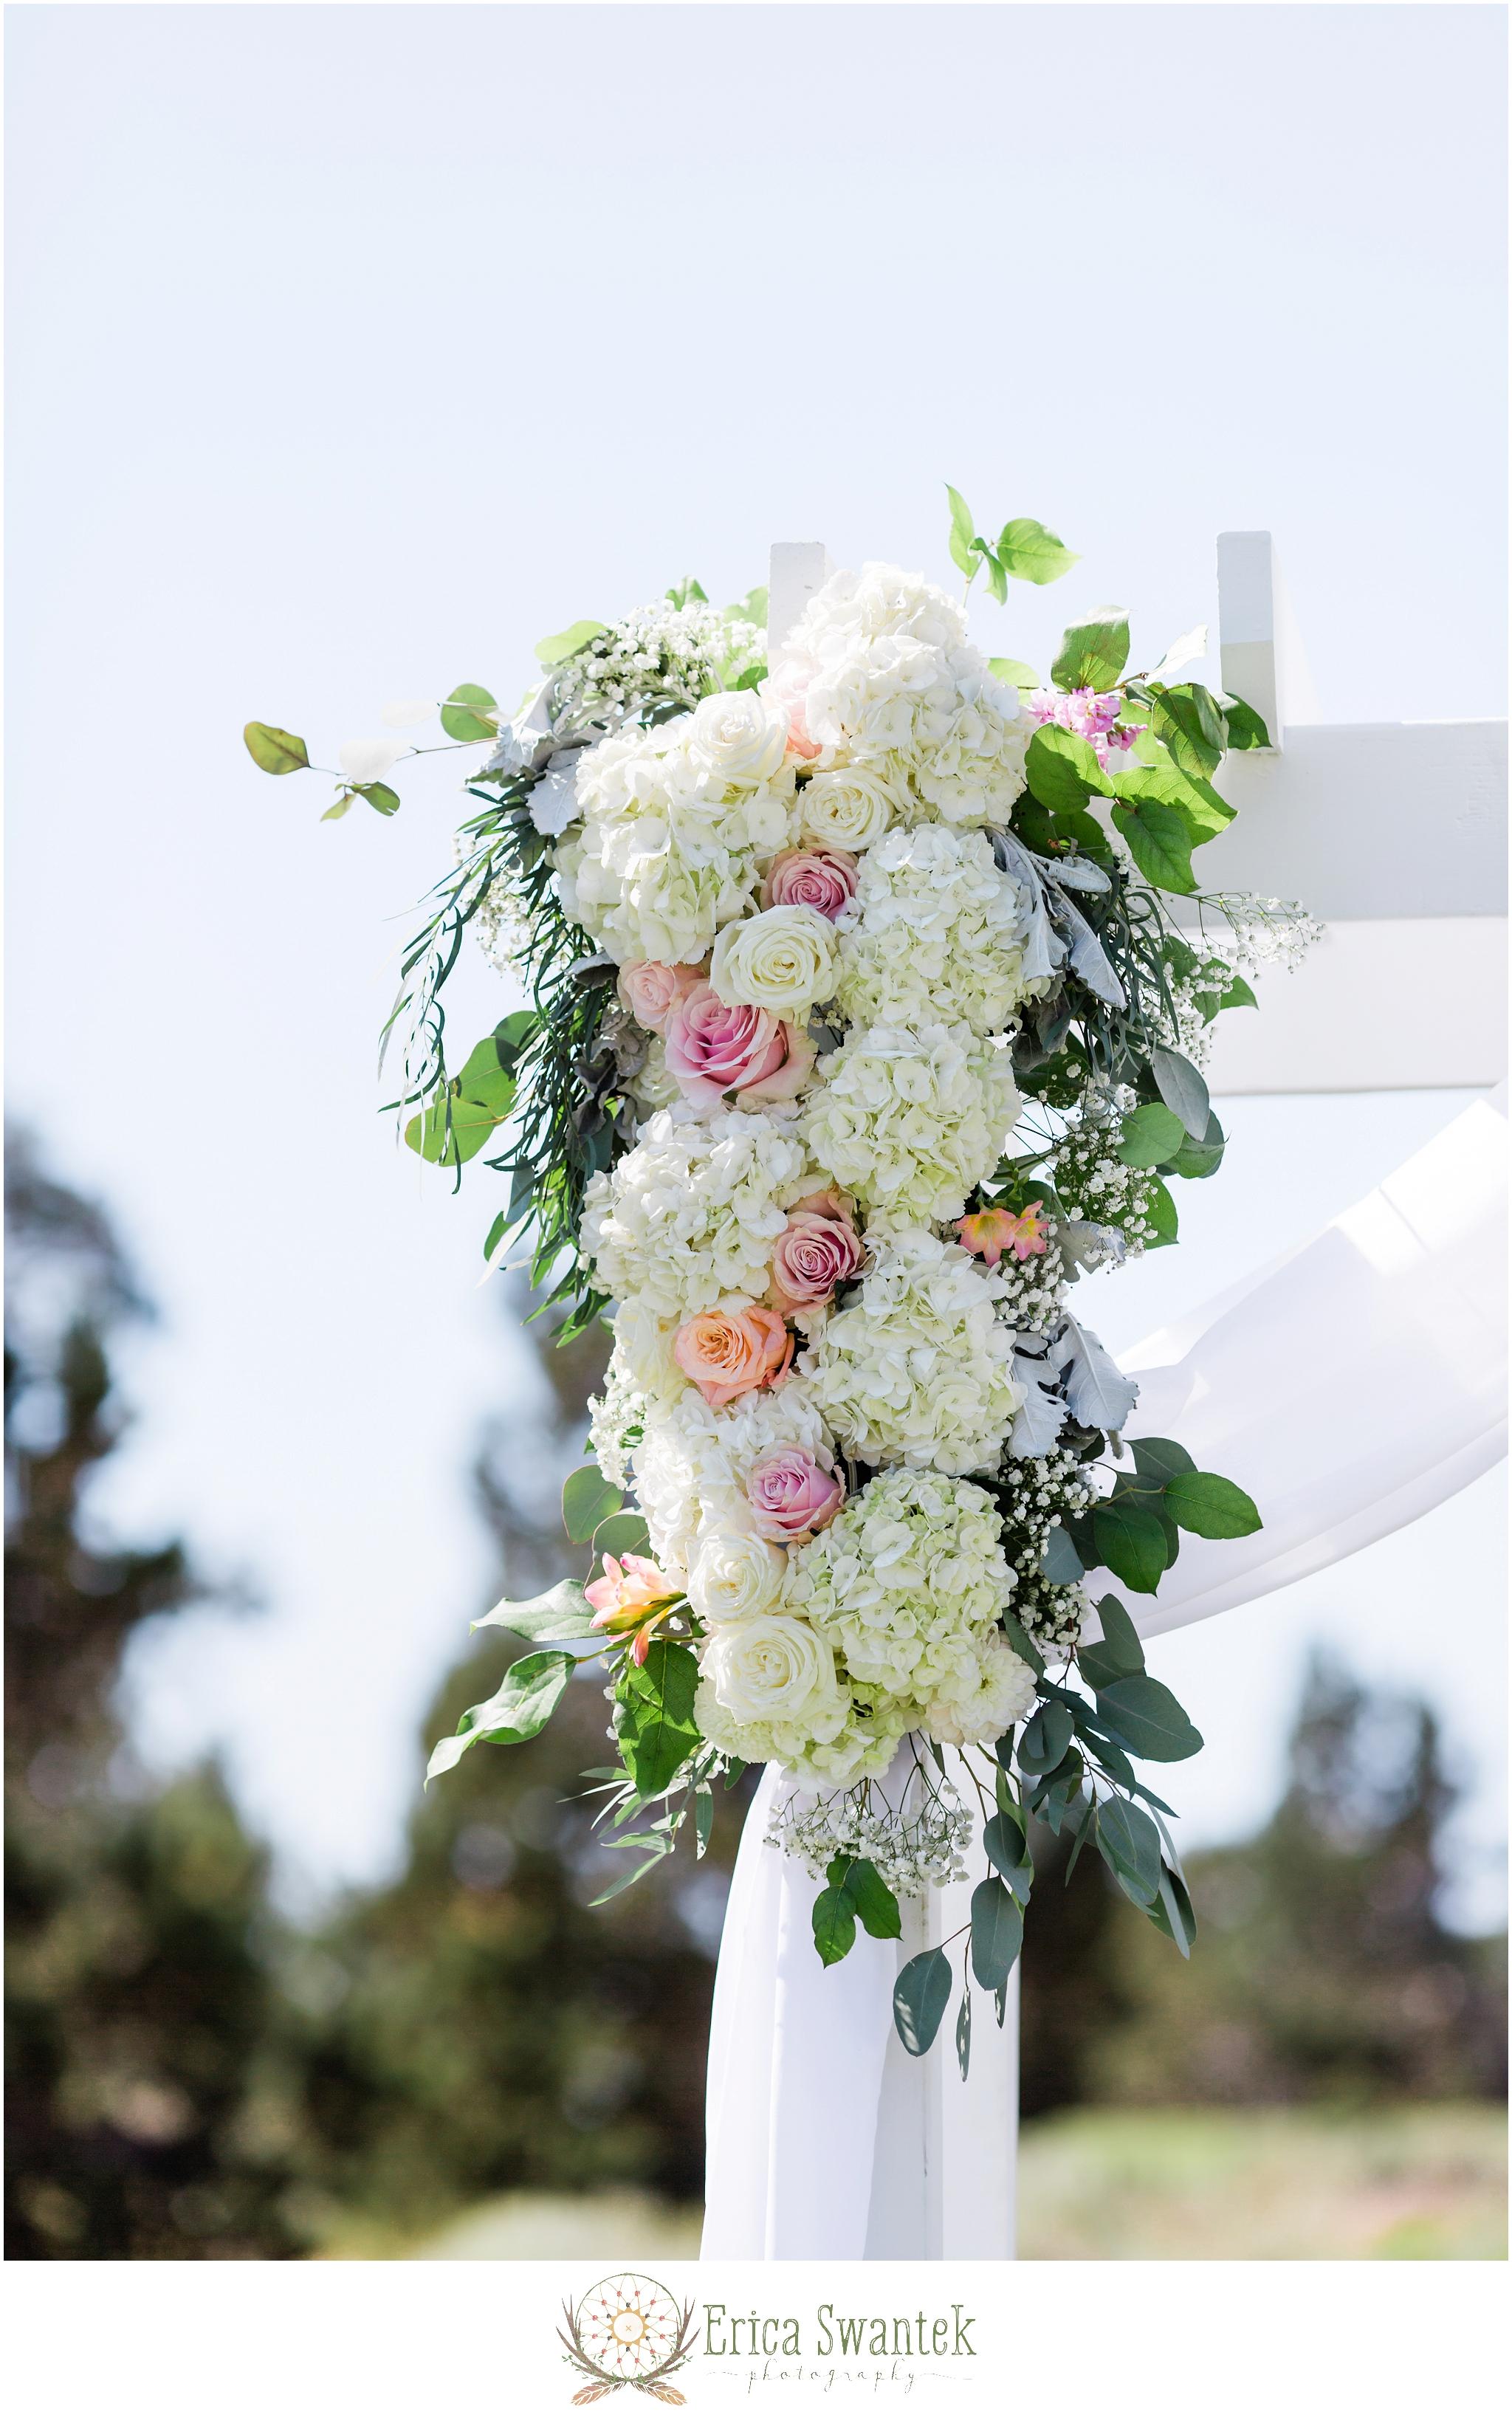 Juniper-Golf-Course Erica-Swantek-Photography Bend Floral Artistry - Ceremony Arbor3.jpg